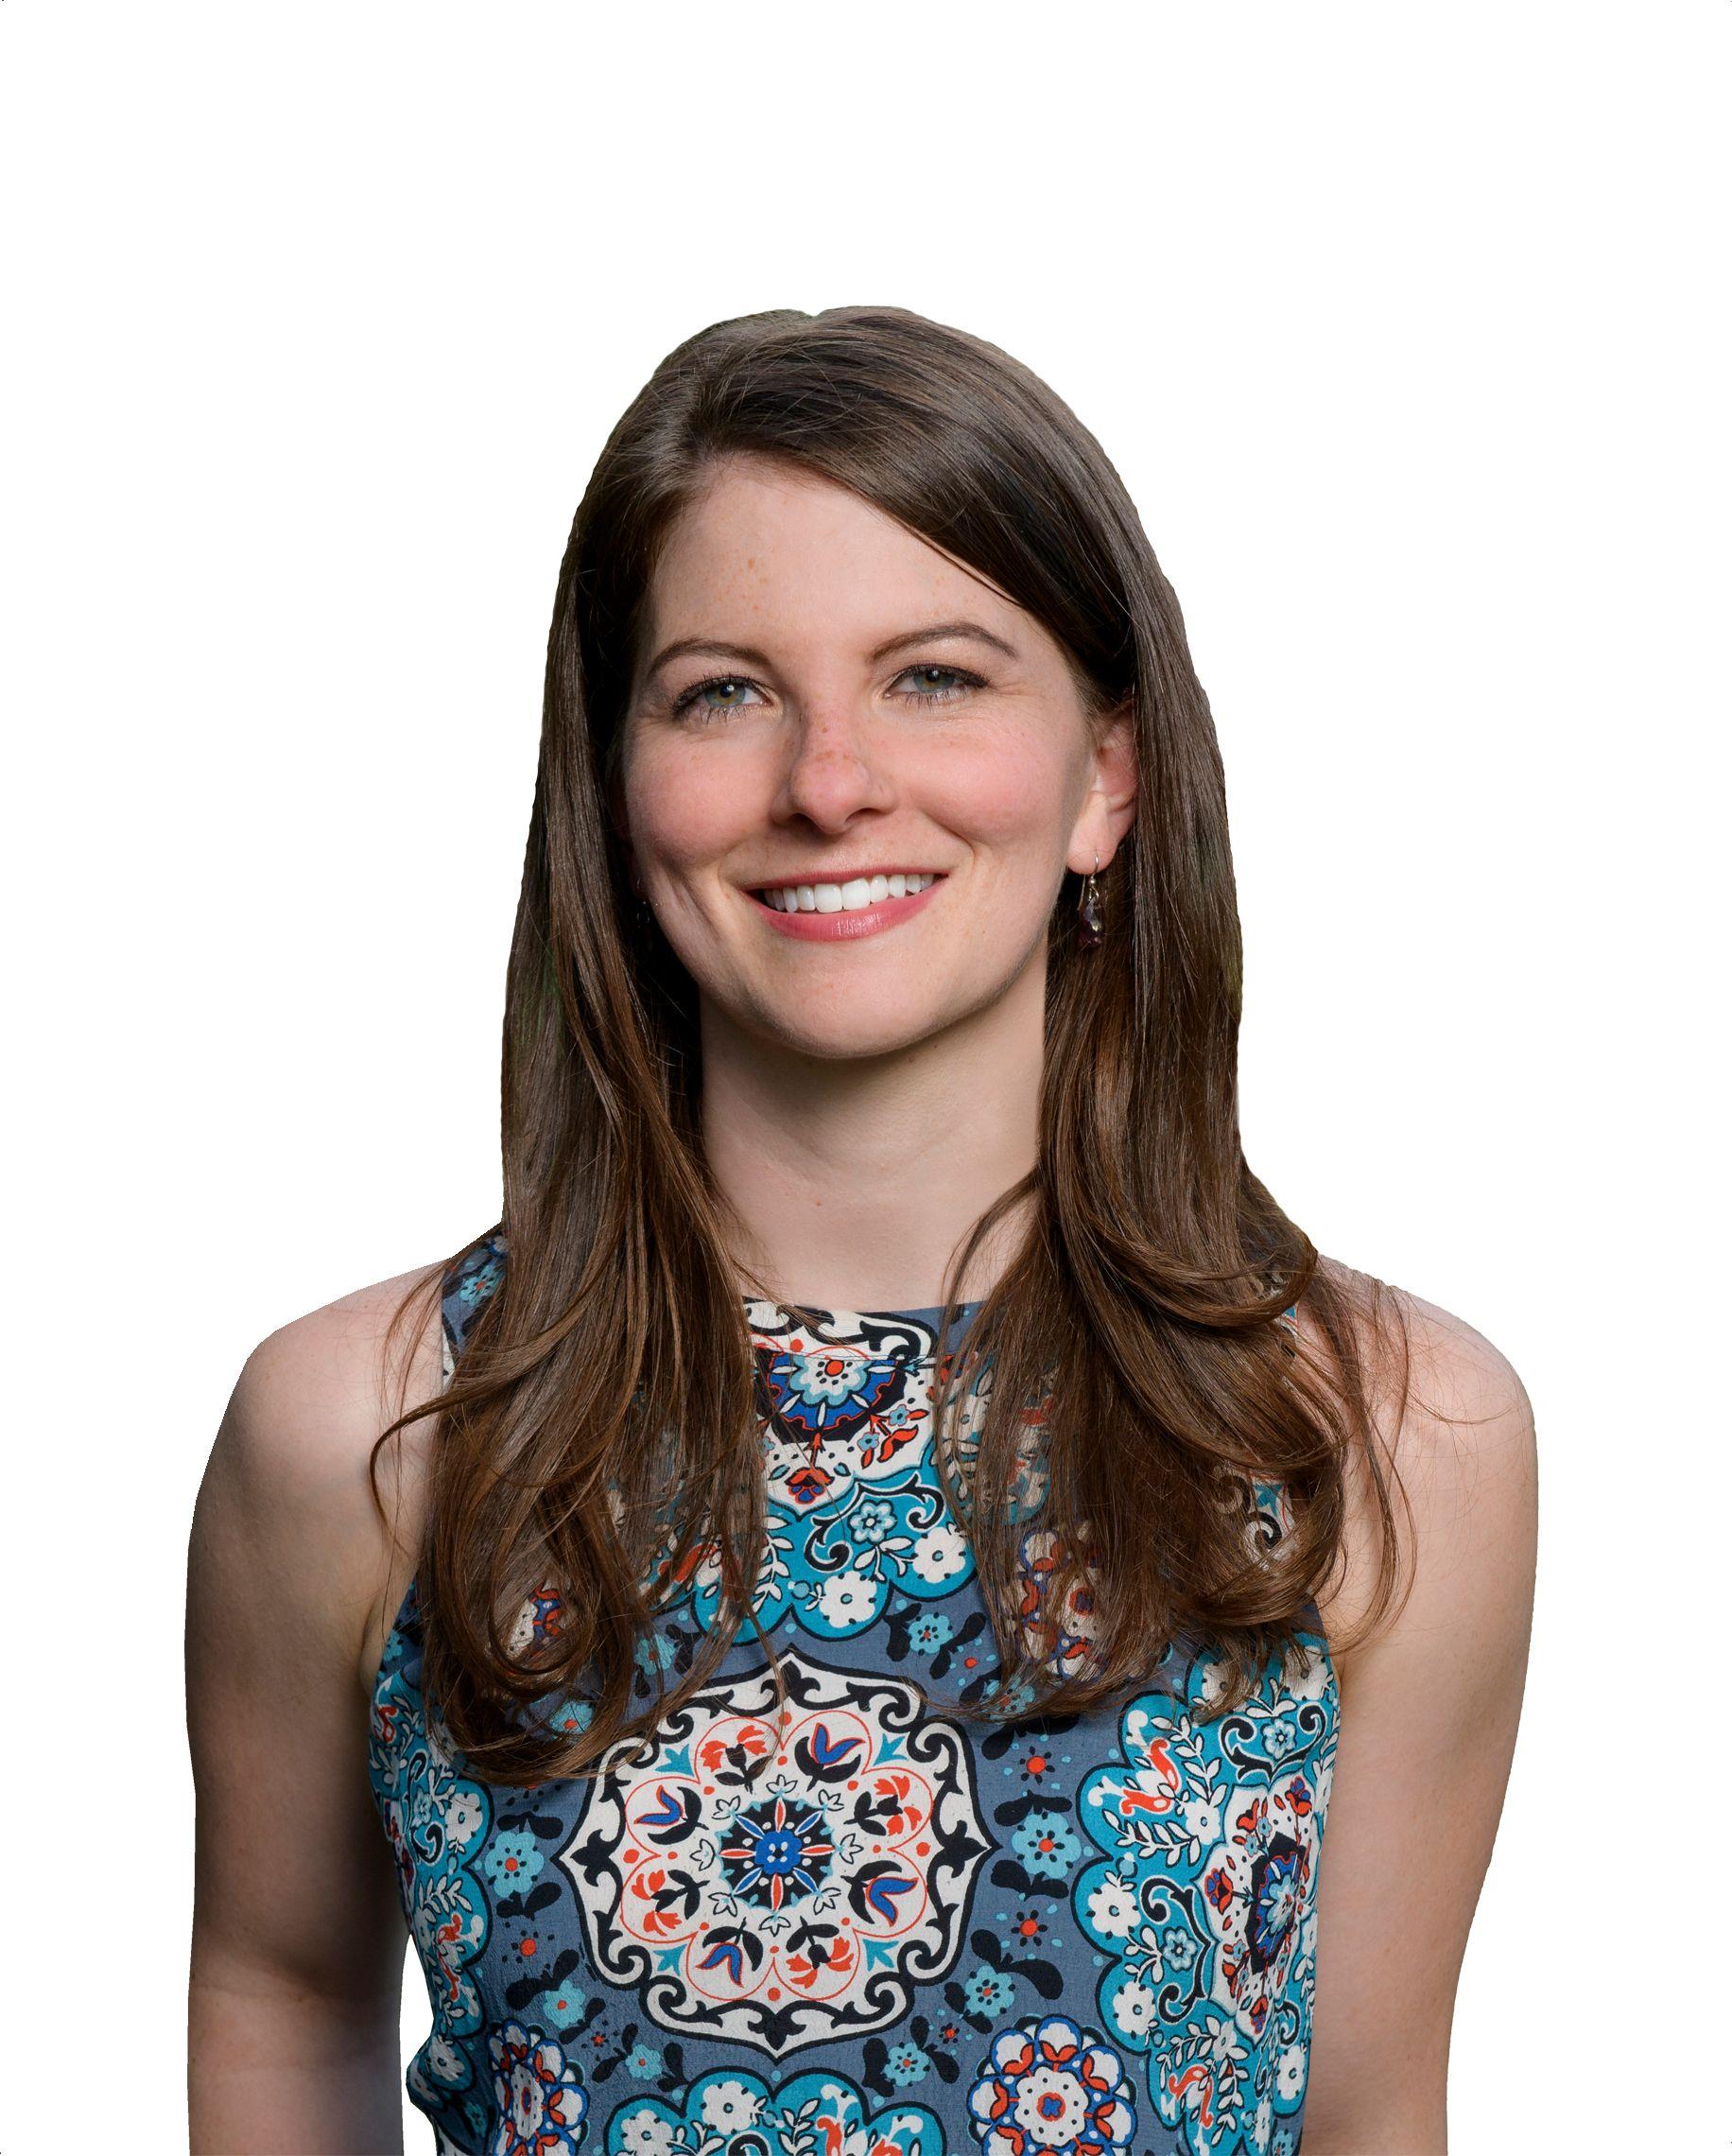 Stephanie Bowden